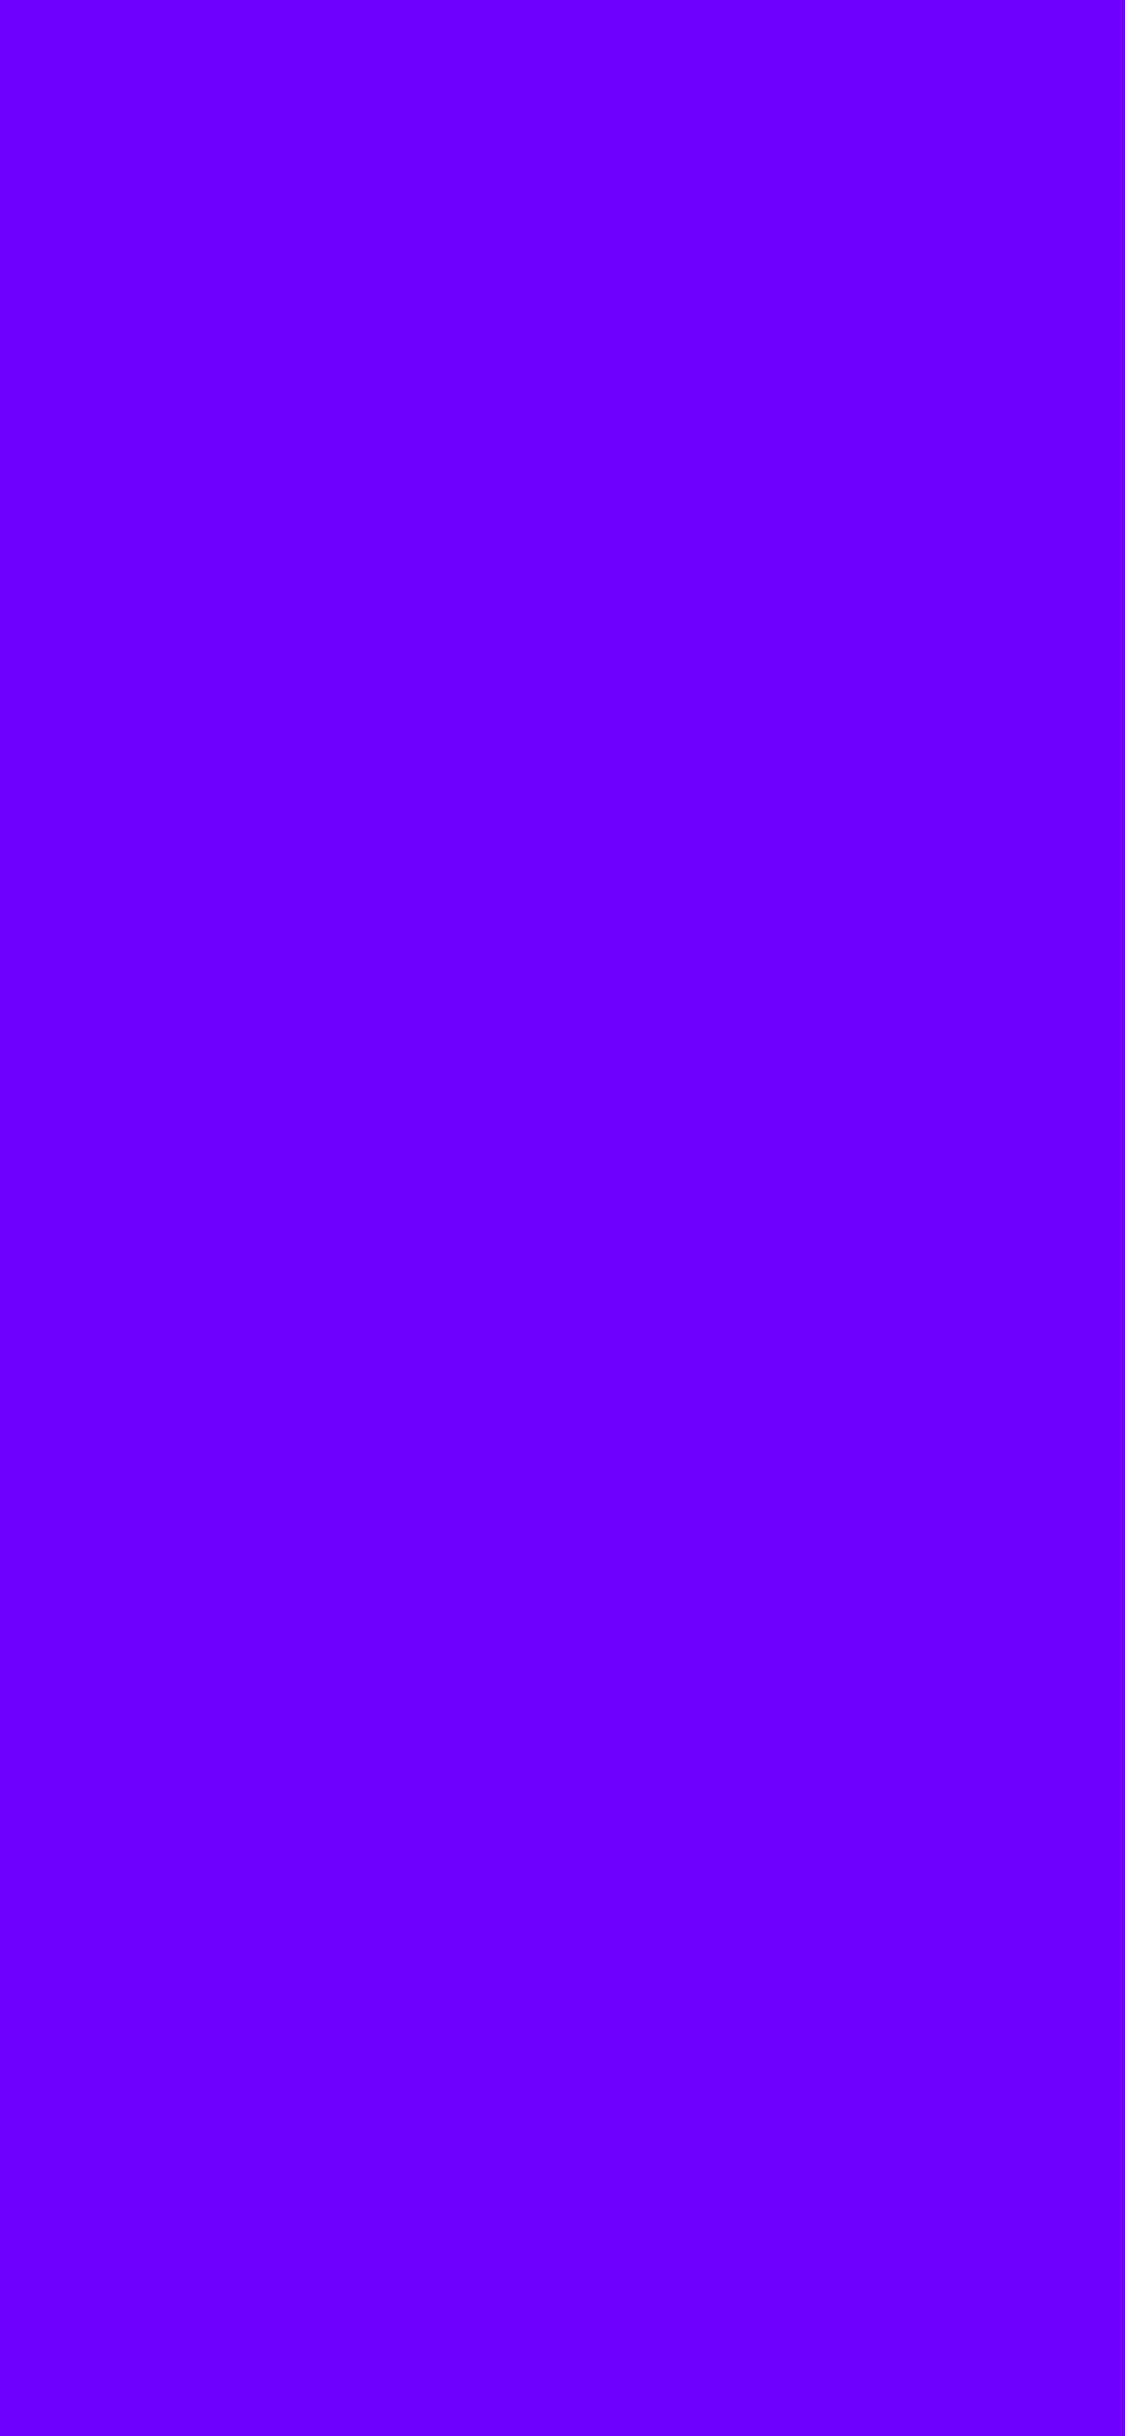 1125x2436 Electric Indigo Solid Color Background